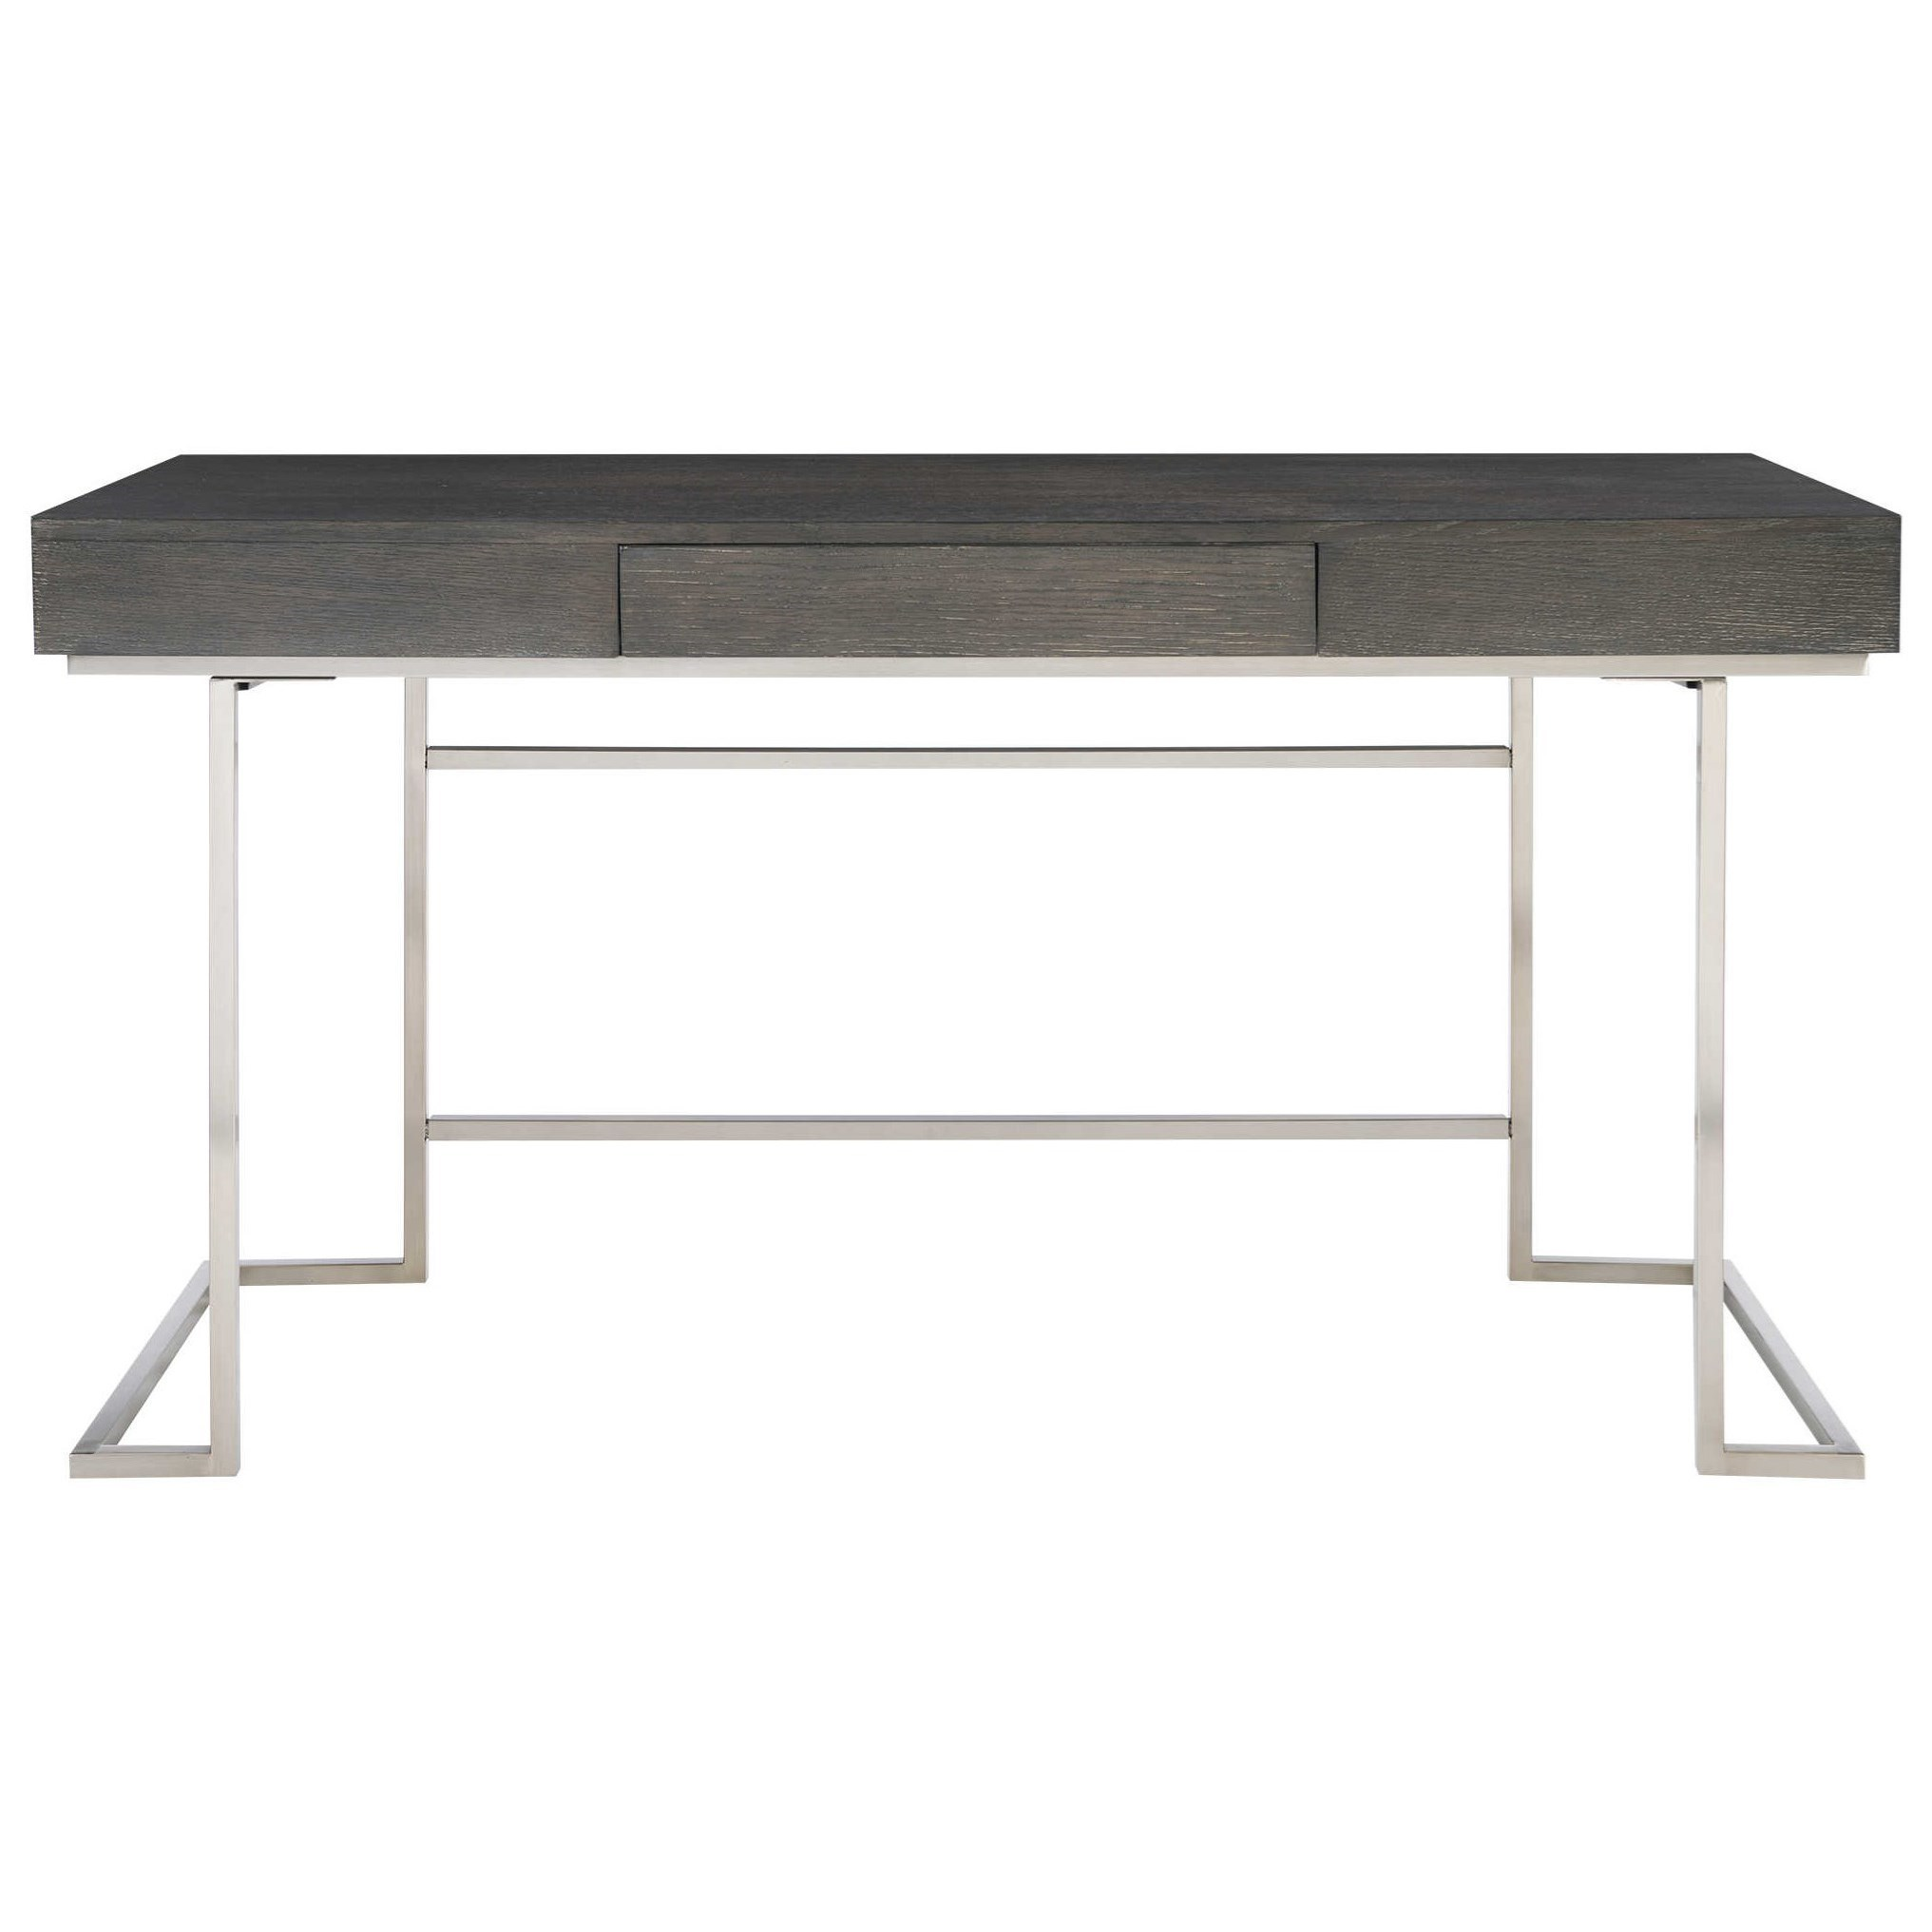 Accent Furniture Claude Modern Oak Desk by Uttermost at Furniture Superstore - Rochester, MN